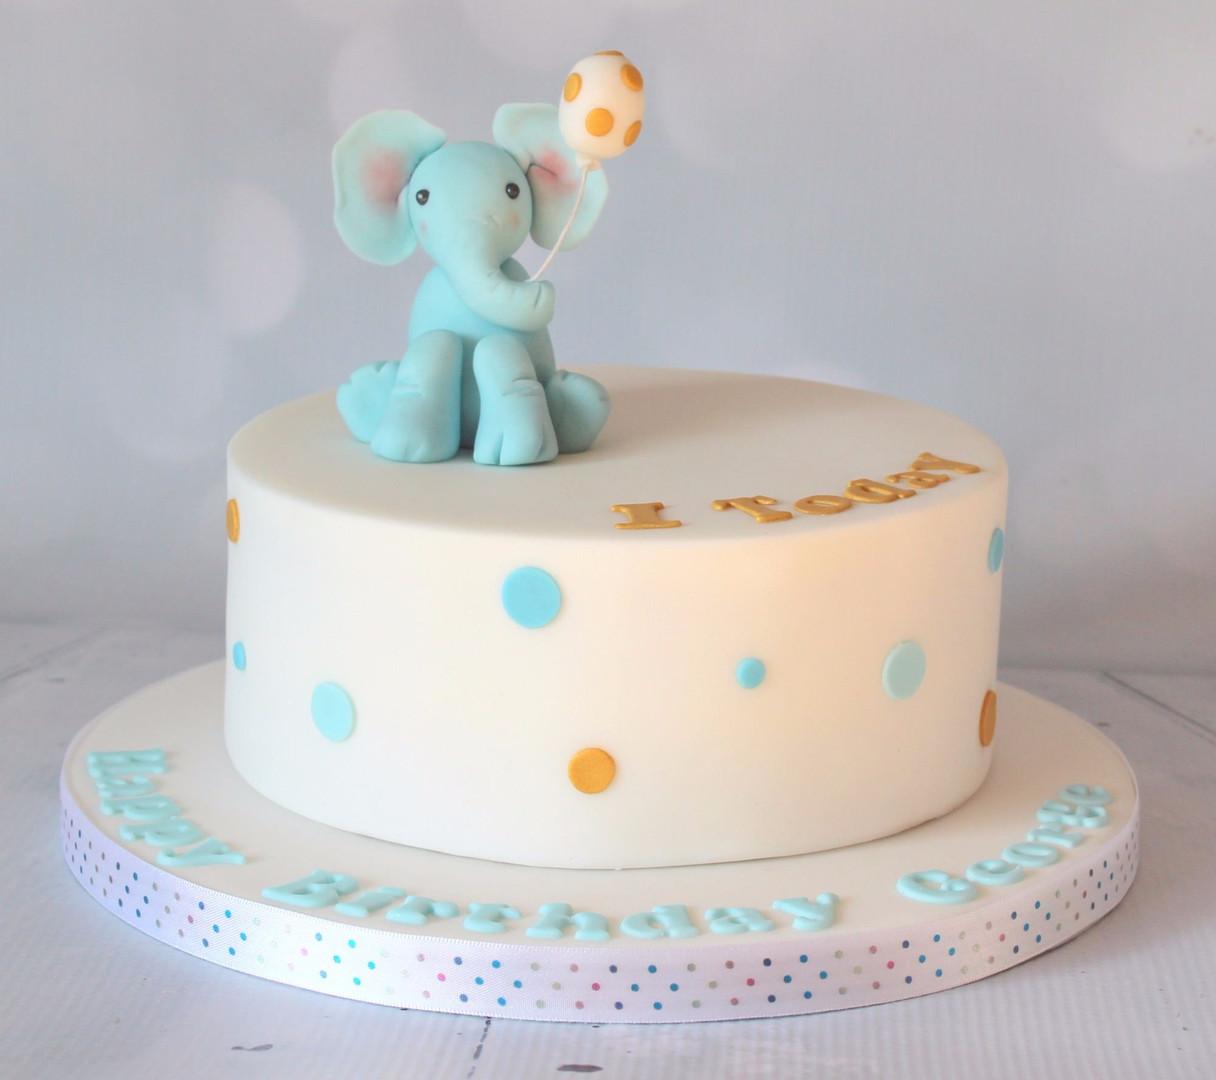 Baby Elephant Cake with Balloon.jpg